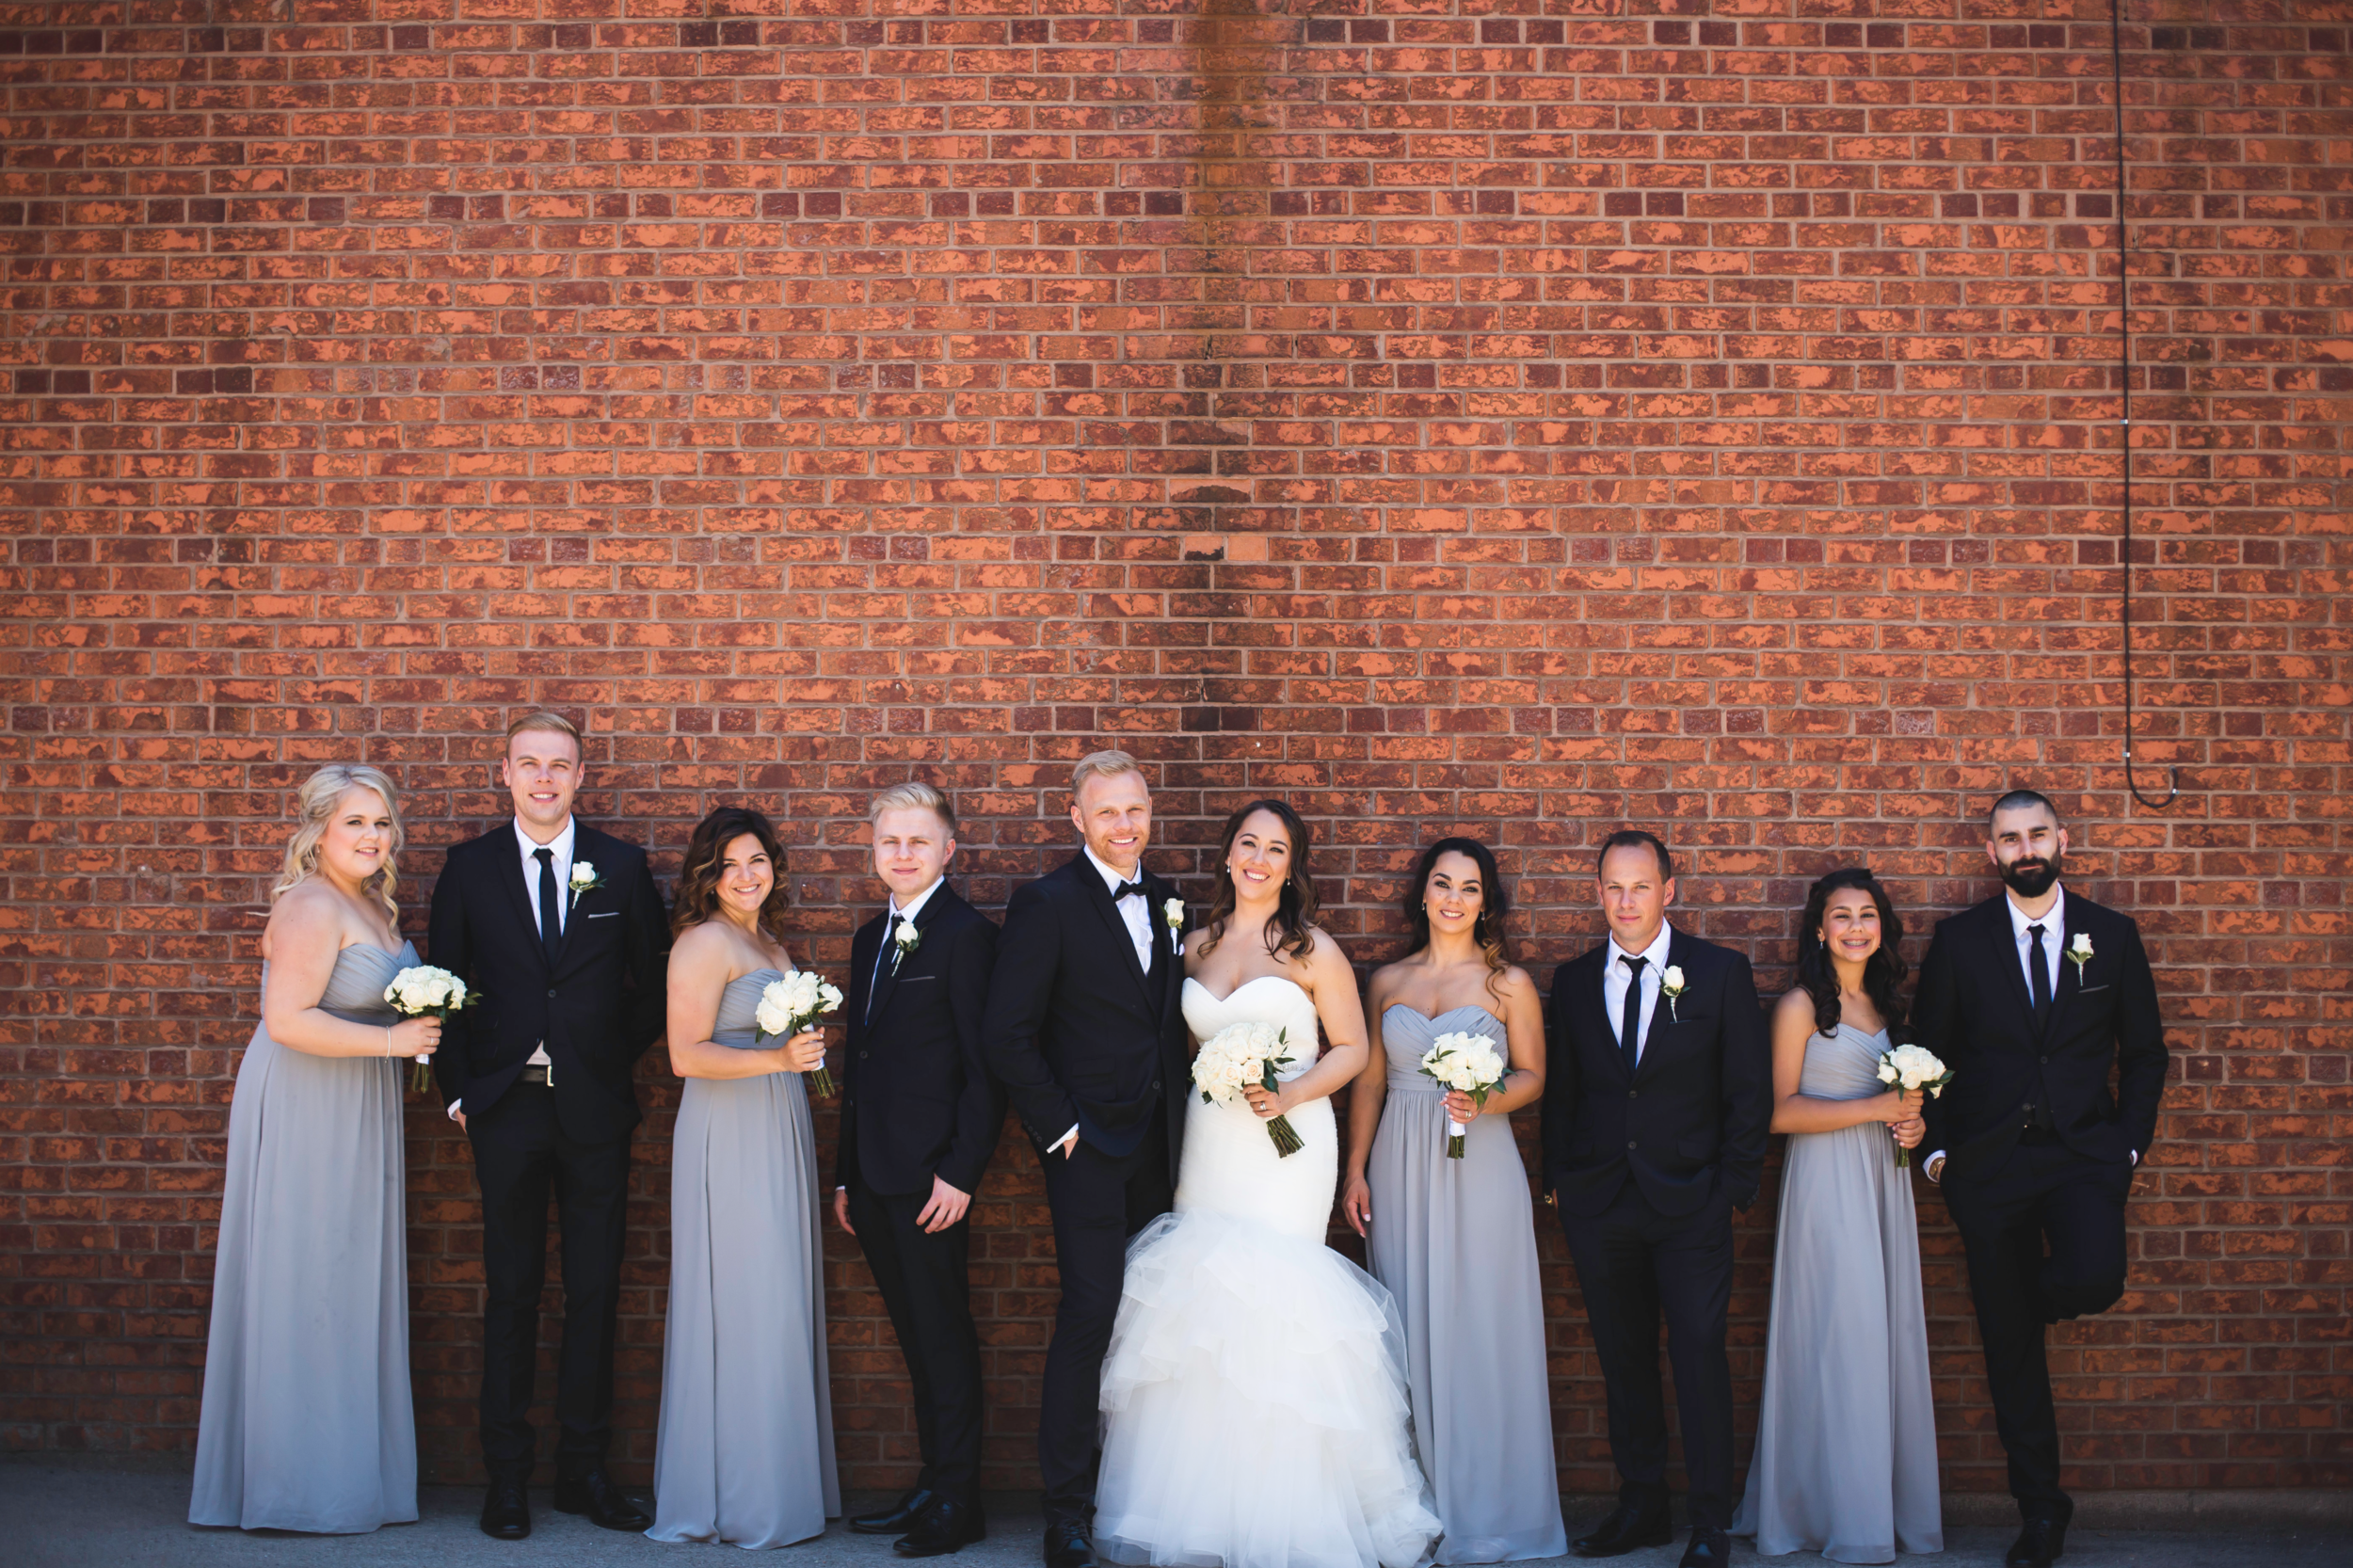 Wedding-Harbour-Banquet-Center-Oakville-Photographer-Wedding-Hamilton-Saint-James-Espresso-Downtown-HamOnt-GTA-Niagara-Toronto-Moments-by-Lauren-Photography-Photo-Image-39-1.png